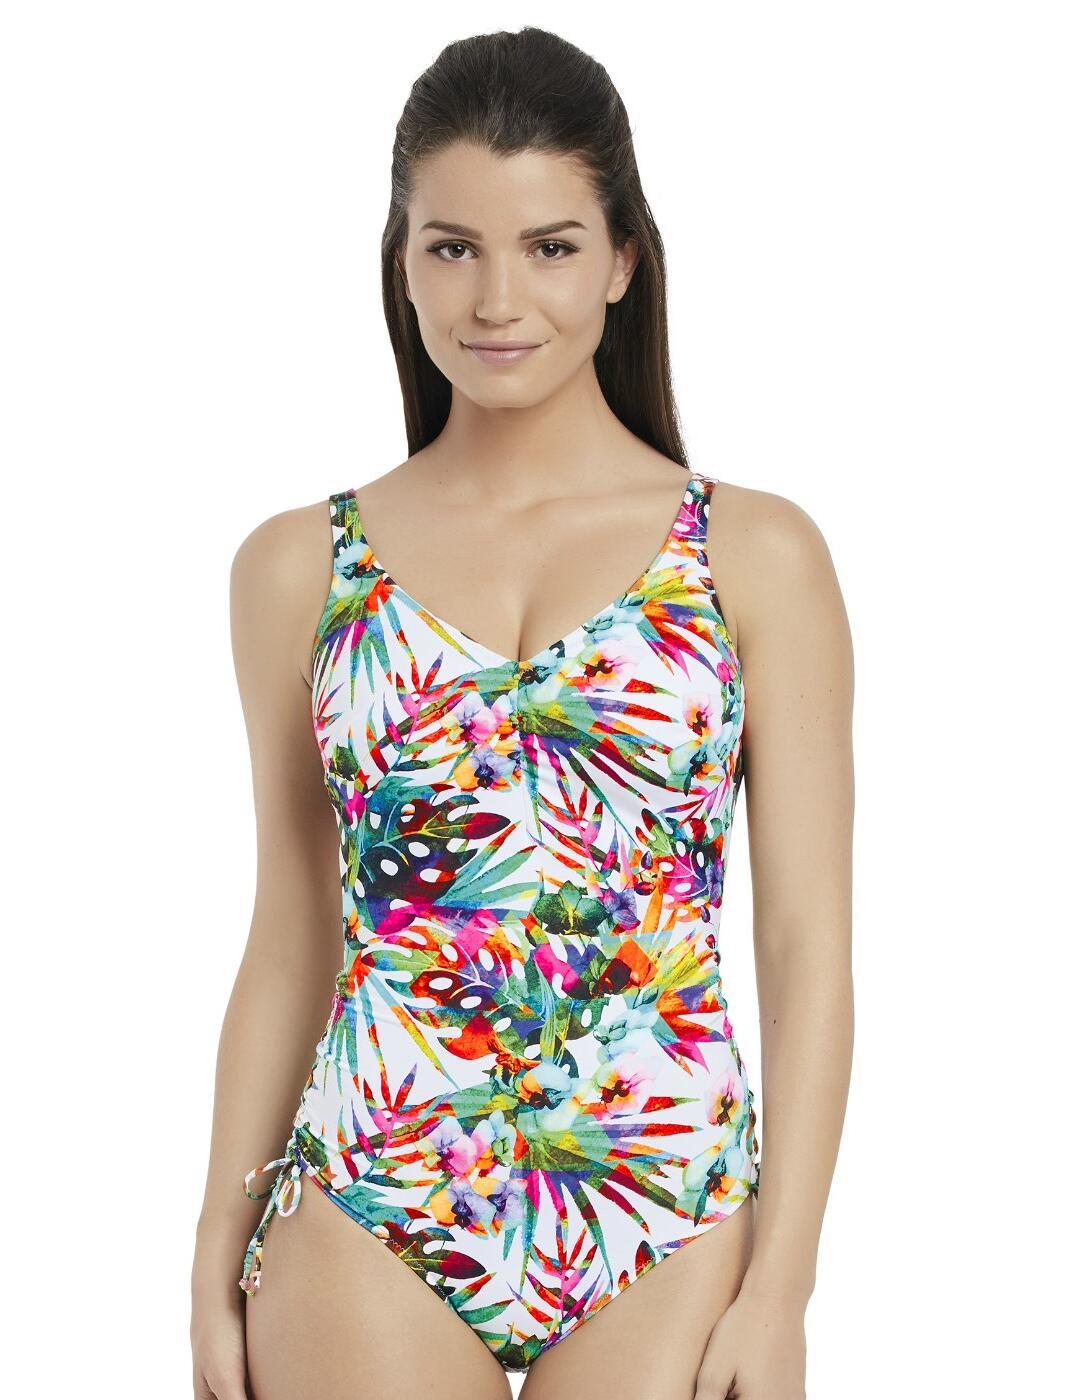 6394 Fantasie Margarita Island V-Neck Suit With Adjustable Legs  - 6394 Multi